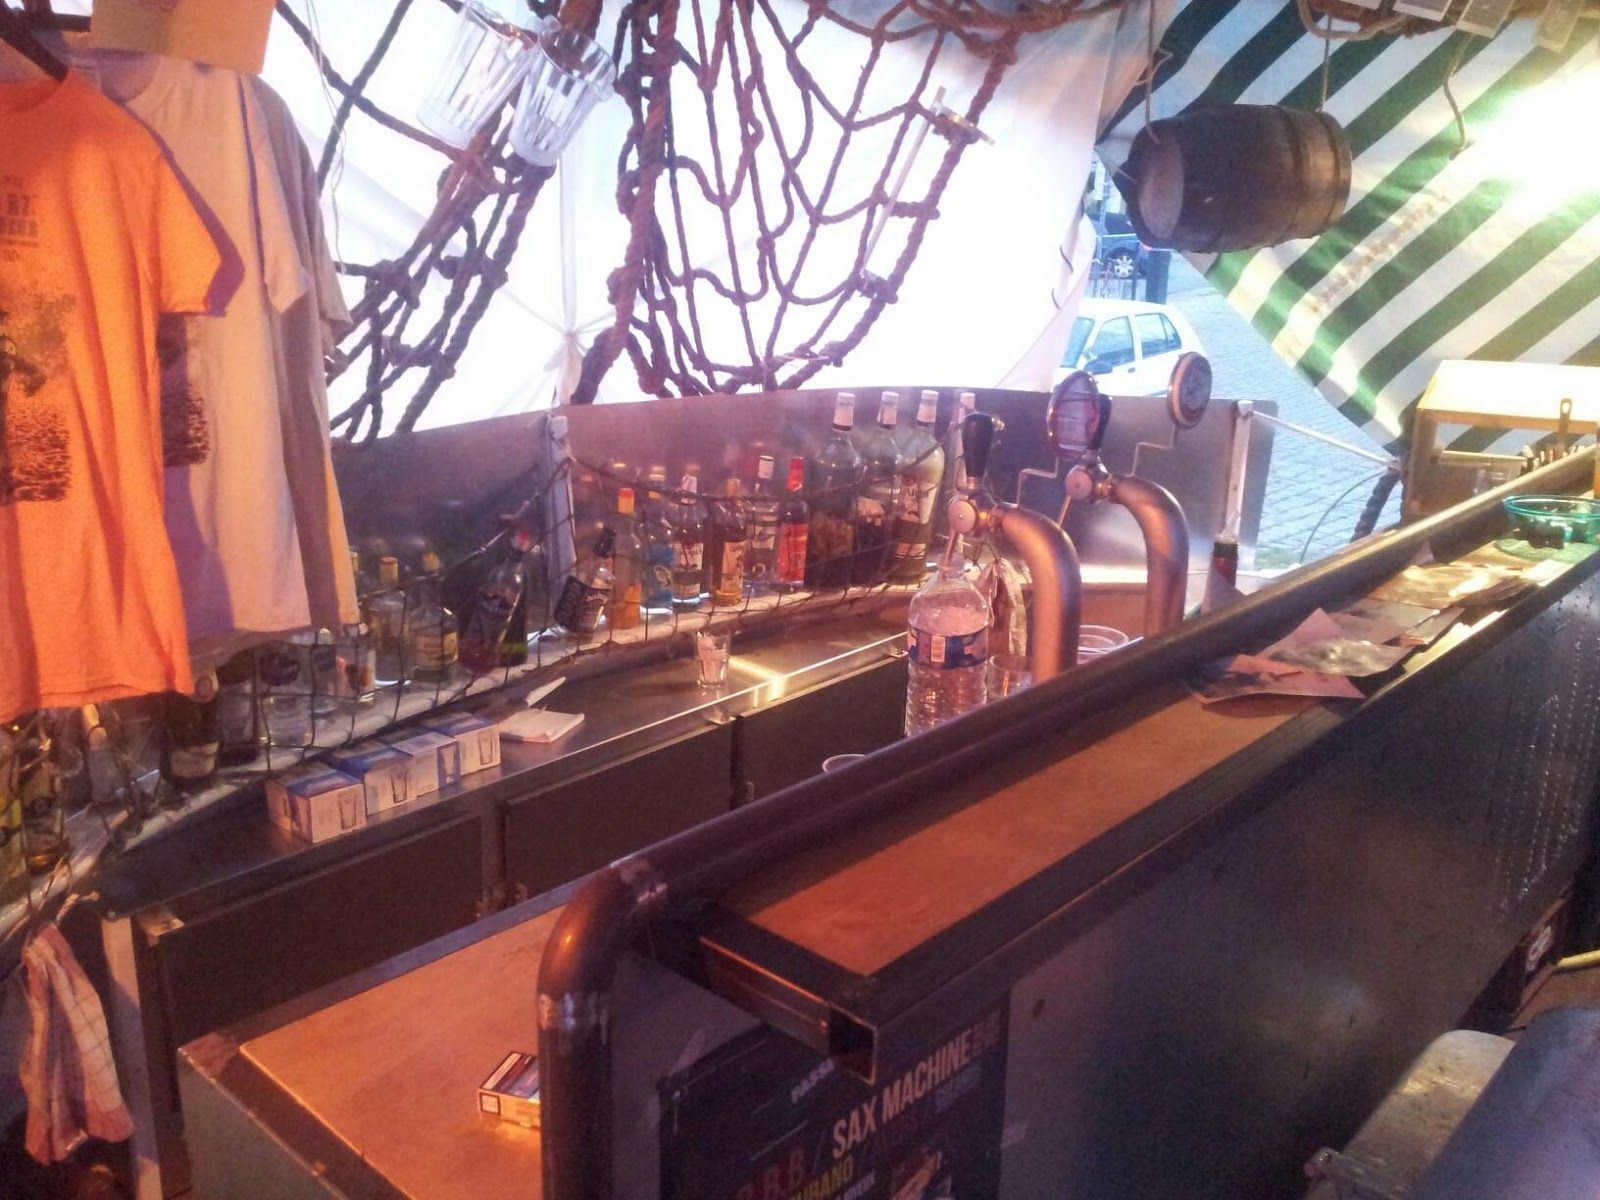 Le Remorqueur Est Un Bateau à Quai Transformé En Bar Club